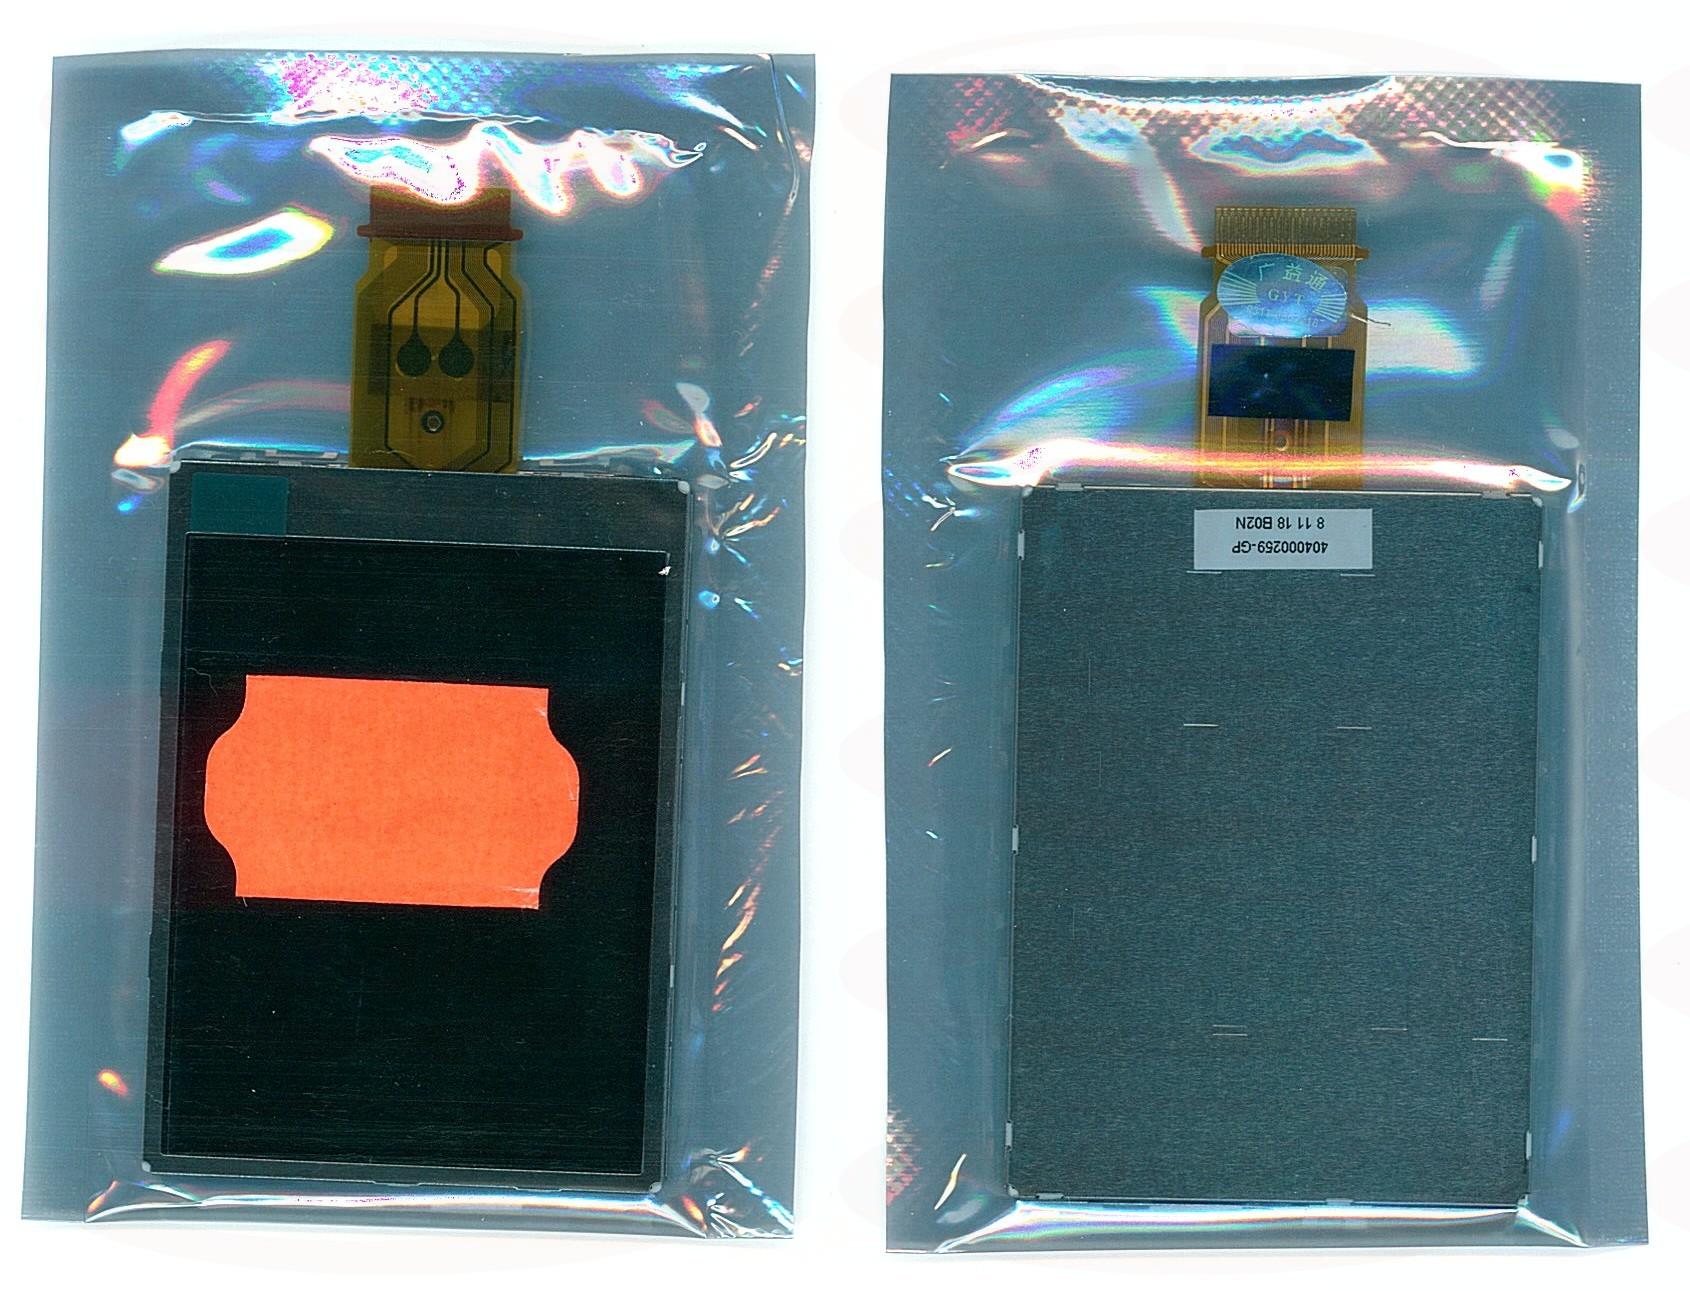 LCD Fuji S5700, S5800 S8000 S8100